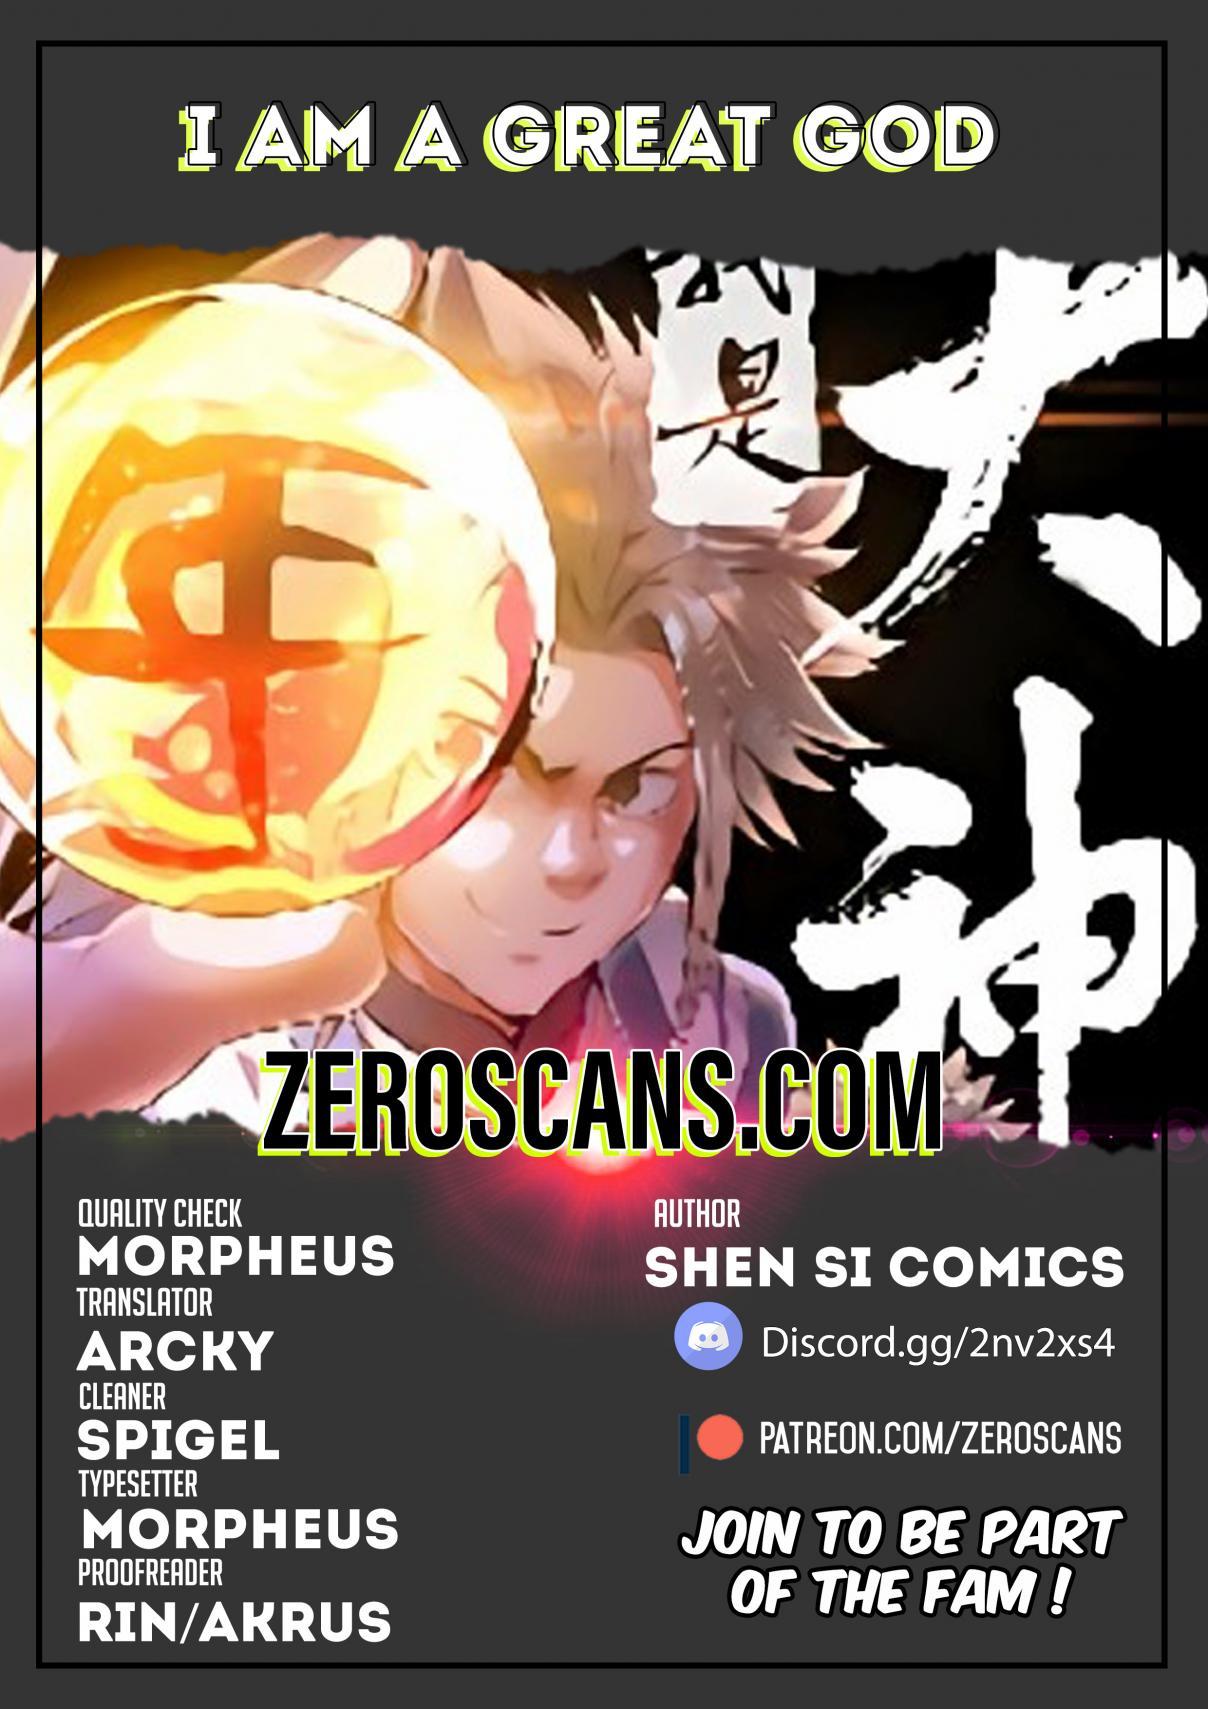 https://im.nineanime.com/comics/pic9/4/21124/512599/b4a1a199b07b19aba0208f1608d23c8e.jpg Page 1